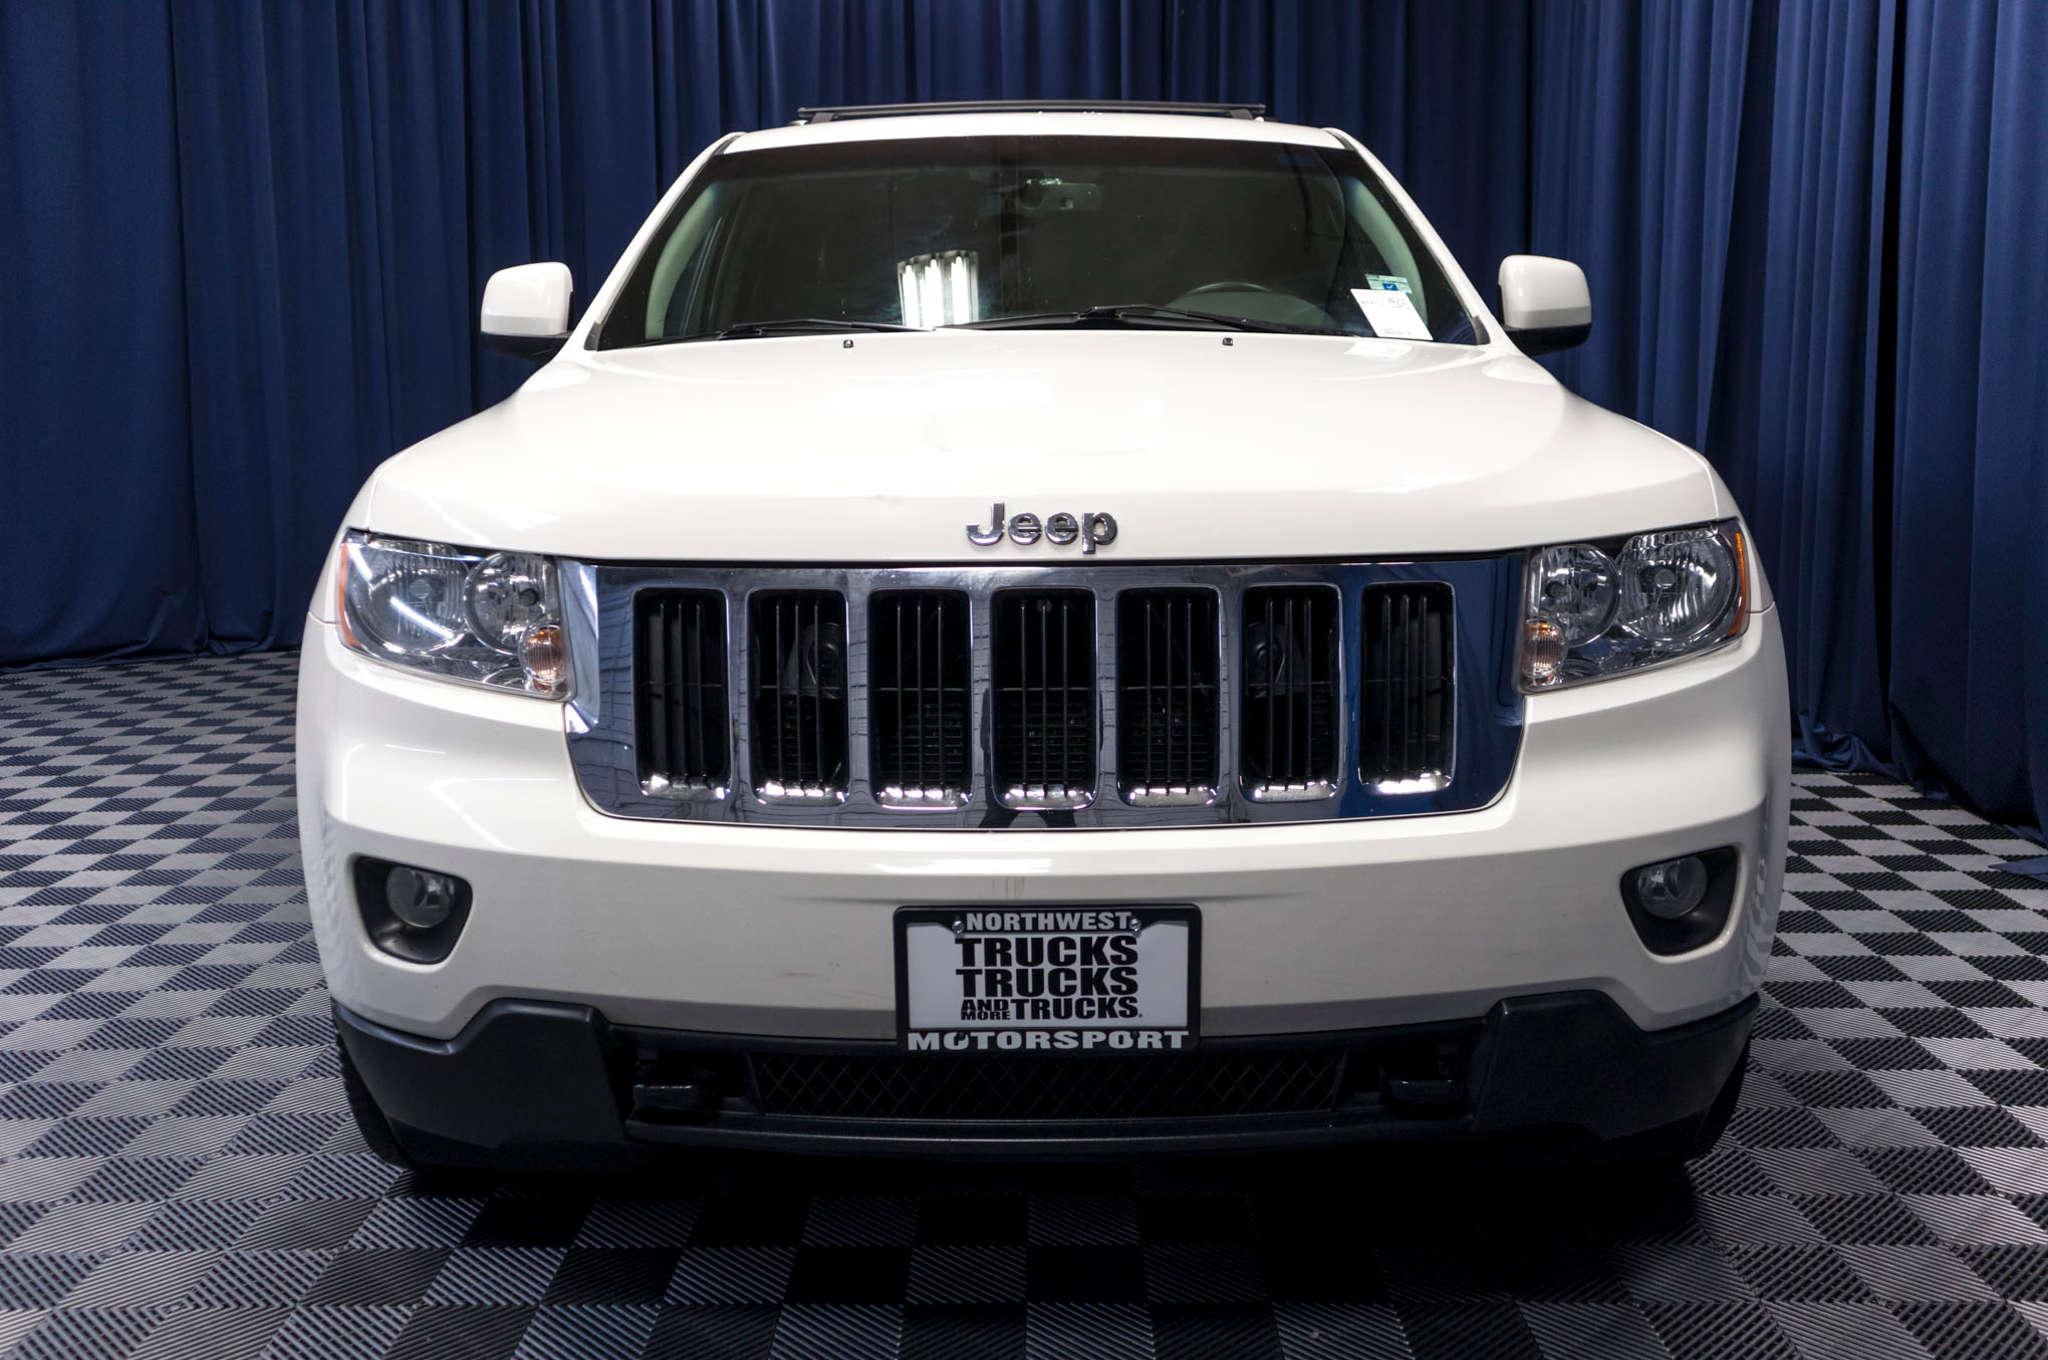 Used 2011 Jeep Grand Cherokee Laredo 4x4 SUV For Sale